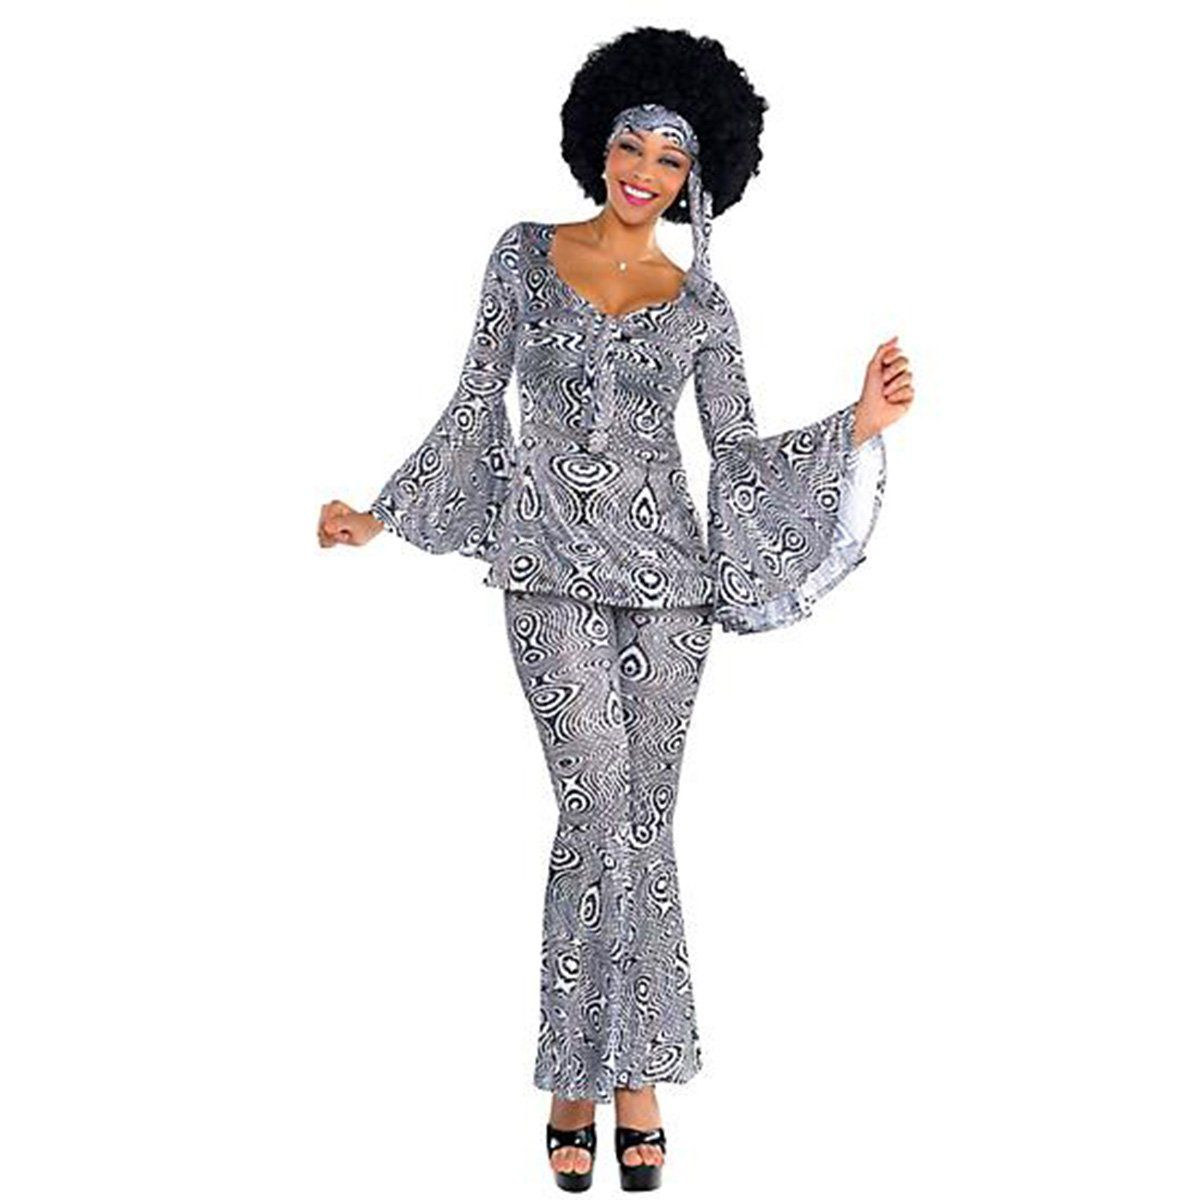 Dancing Queen Costume For Women Disco Costume 70s Fancy Dress Disco Outfit [ 1200 x 1200 Pixel ]